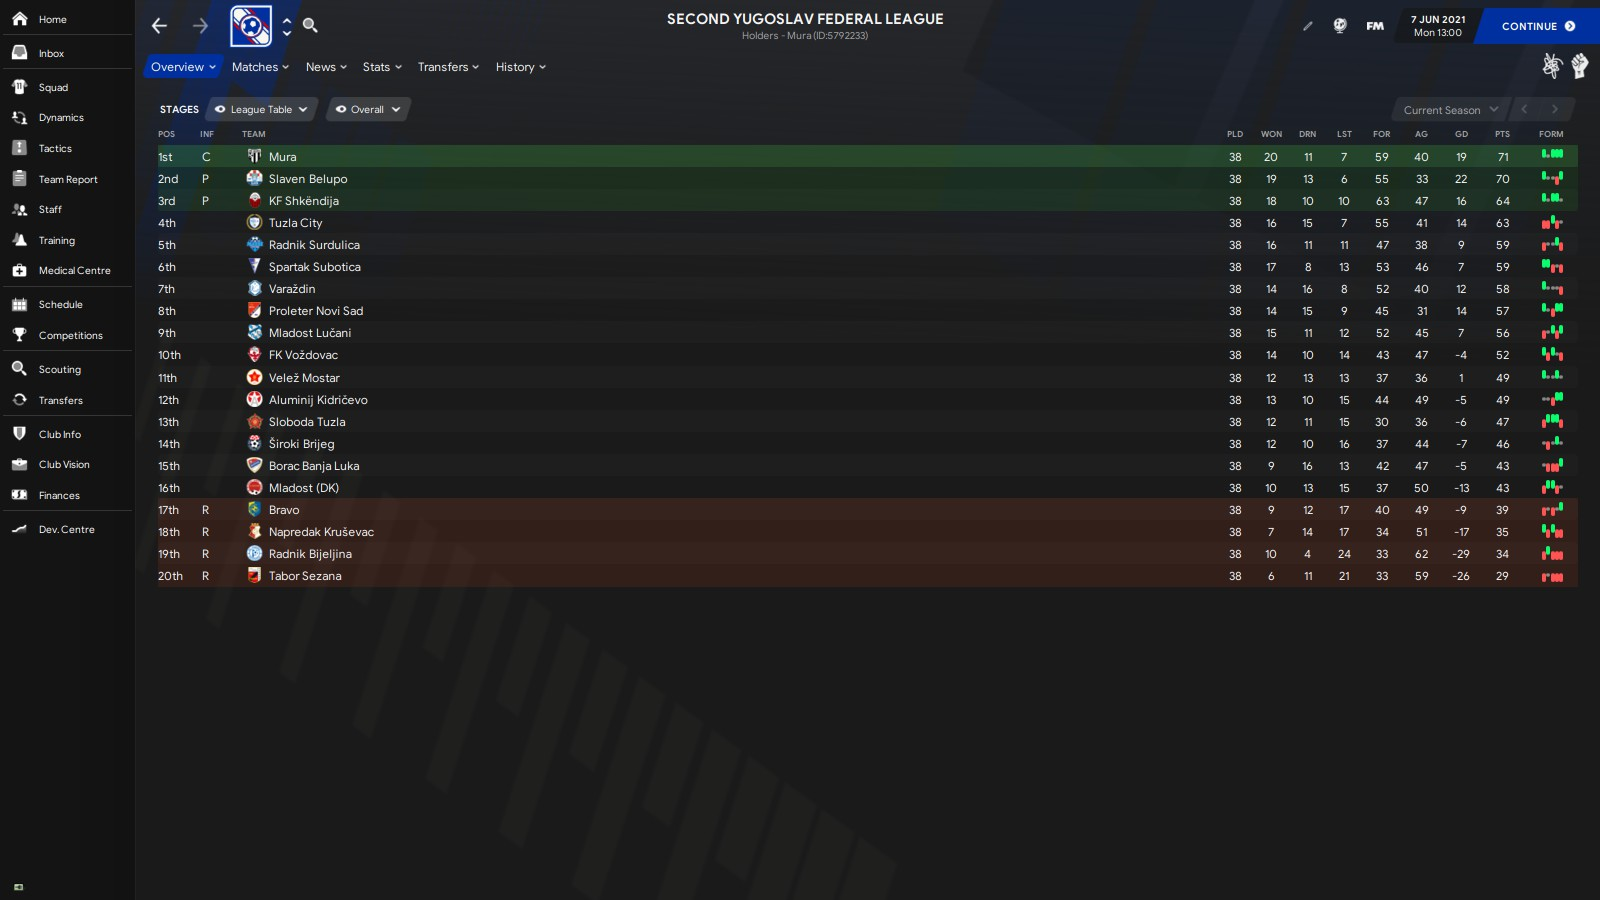 Second League 2021.jpg